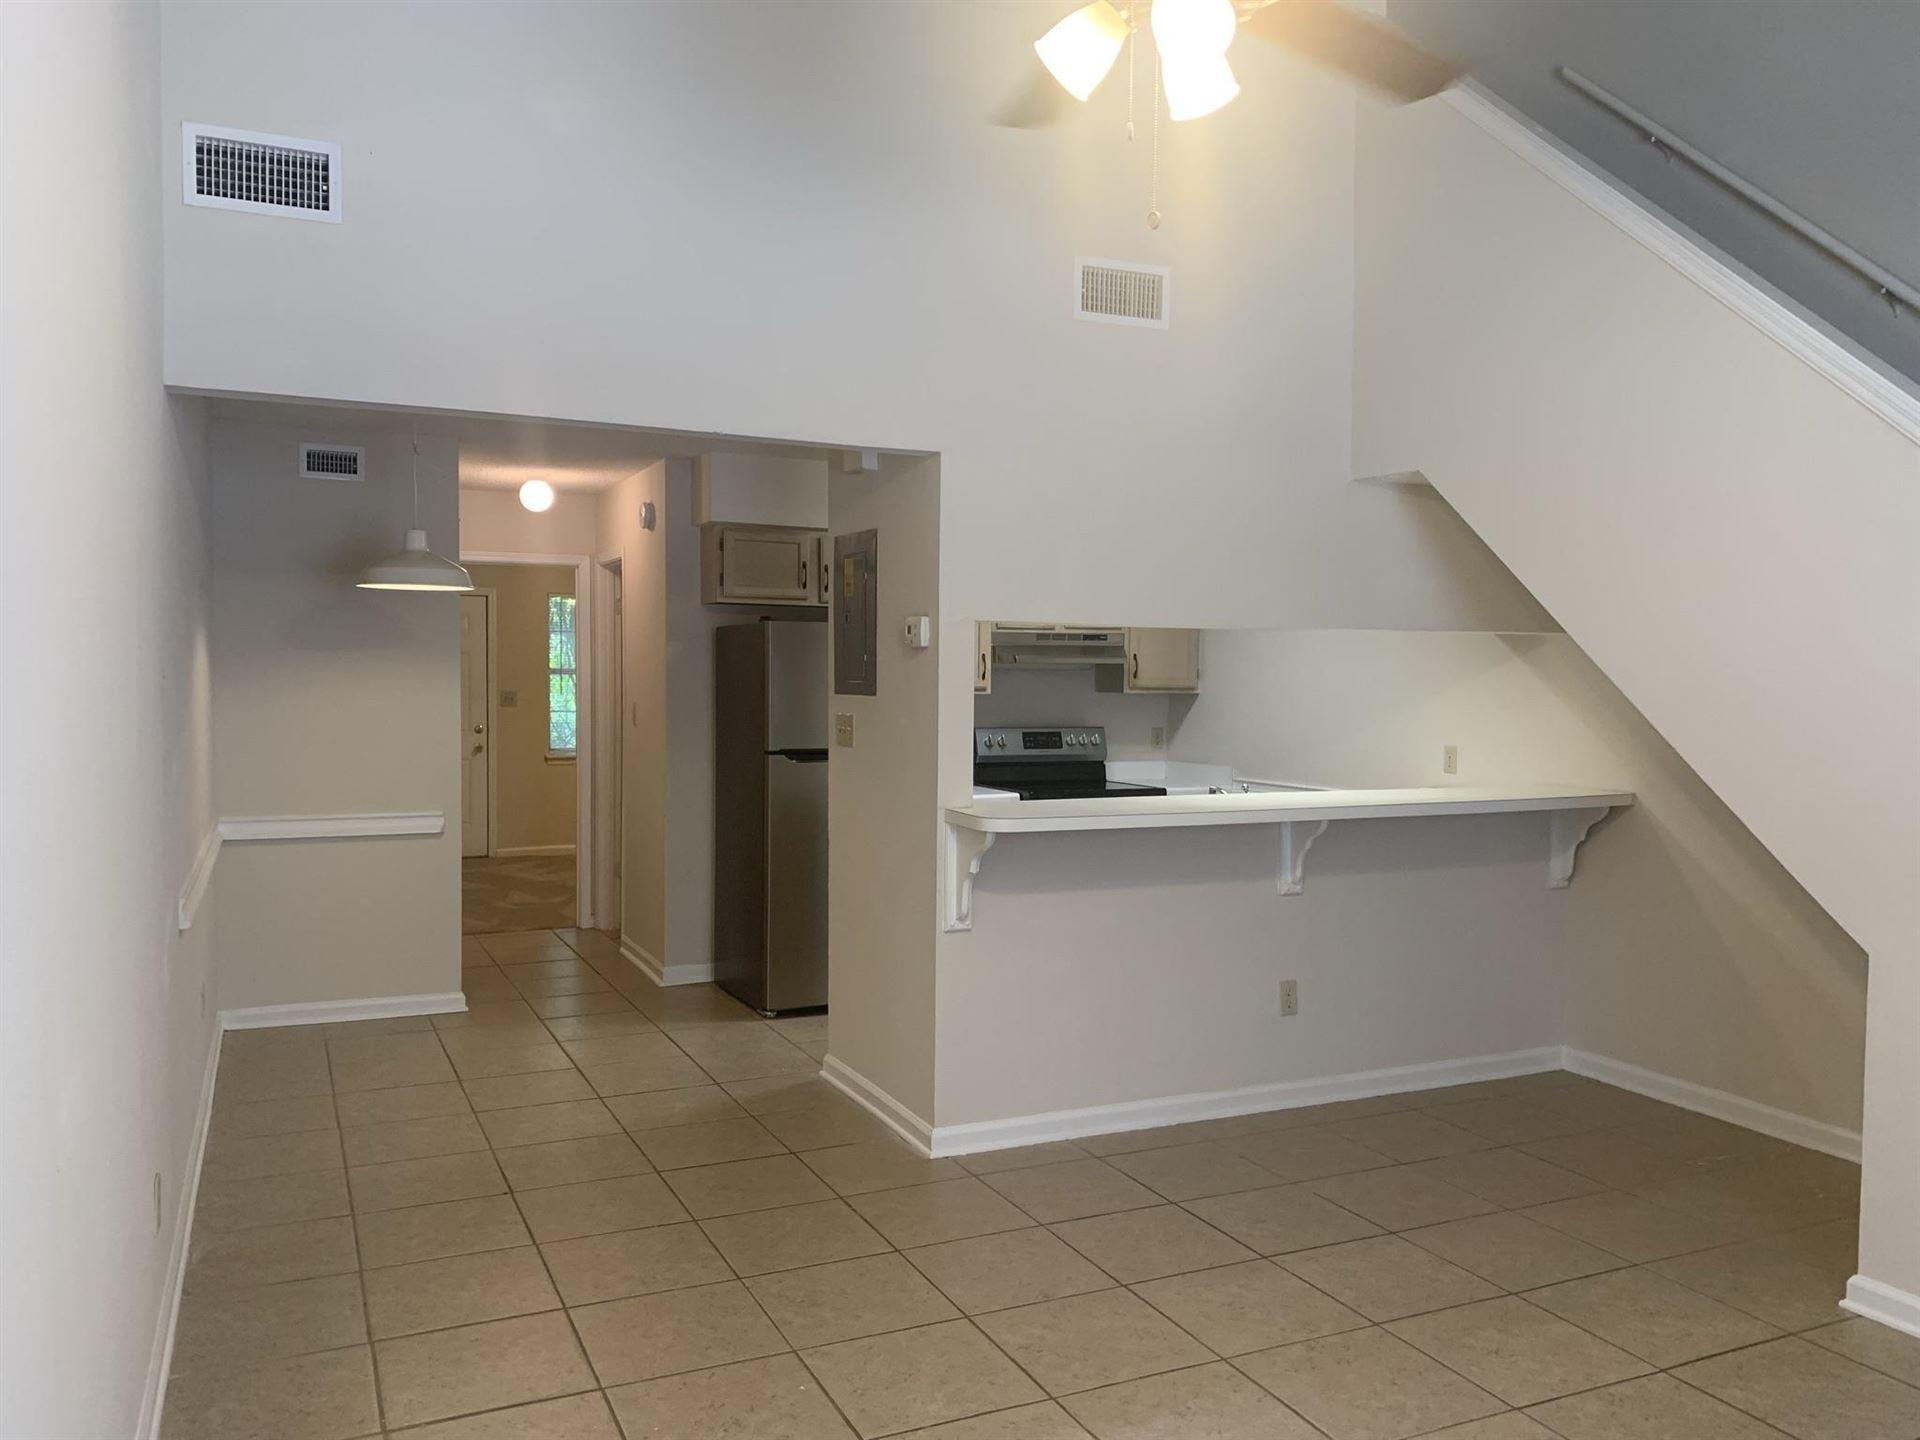 Photo of 2386 Parrot Lane, TALLAHASSEE, FL 32303 (MLS # 338814)